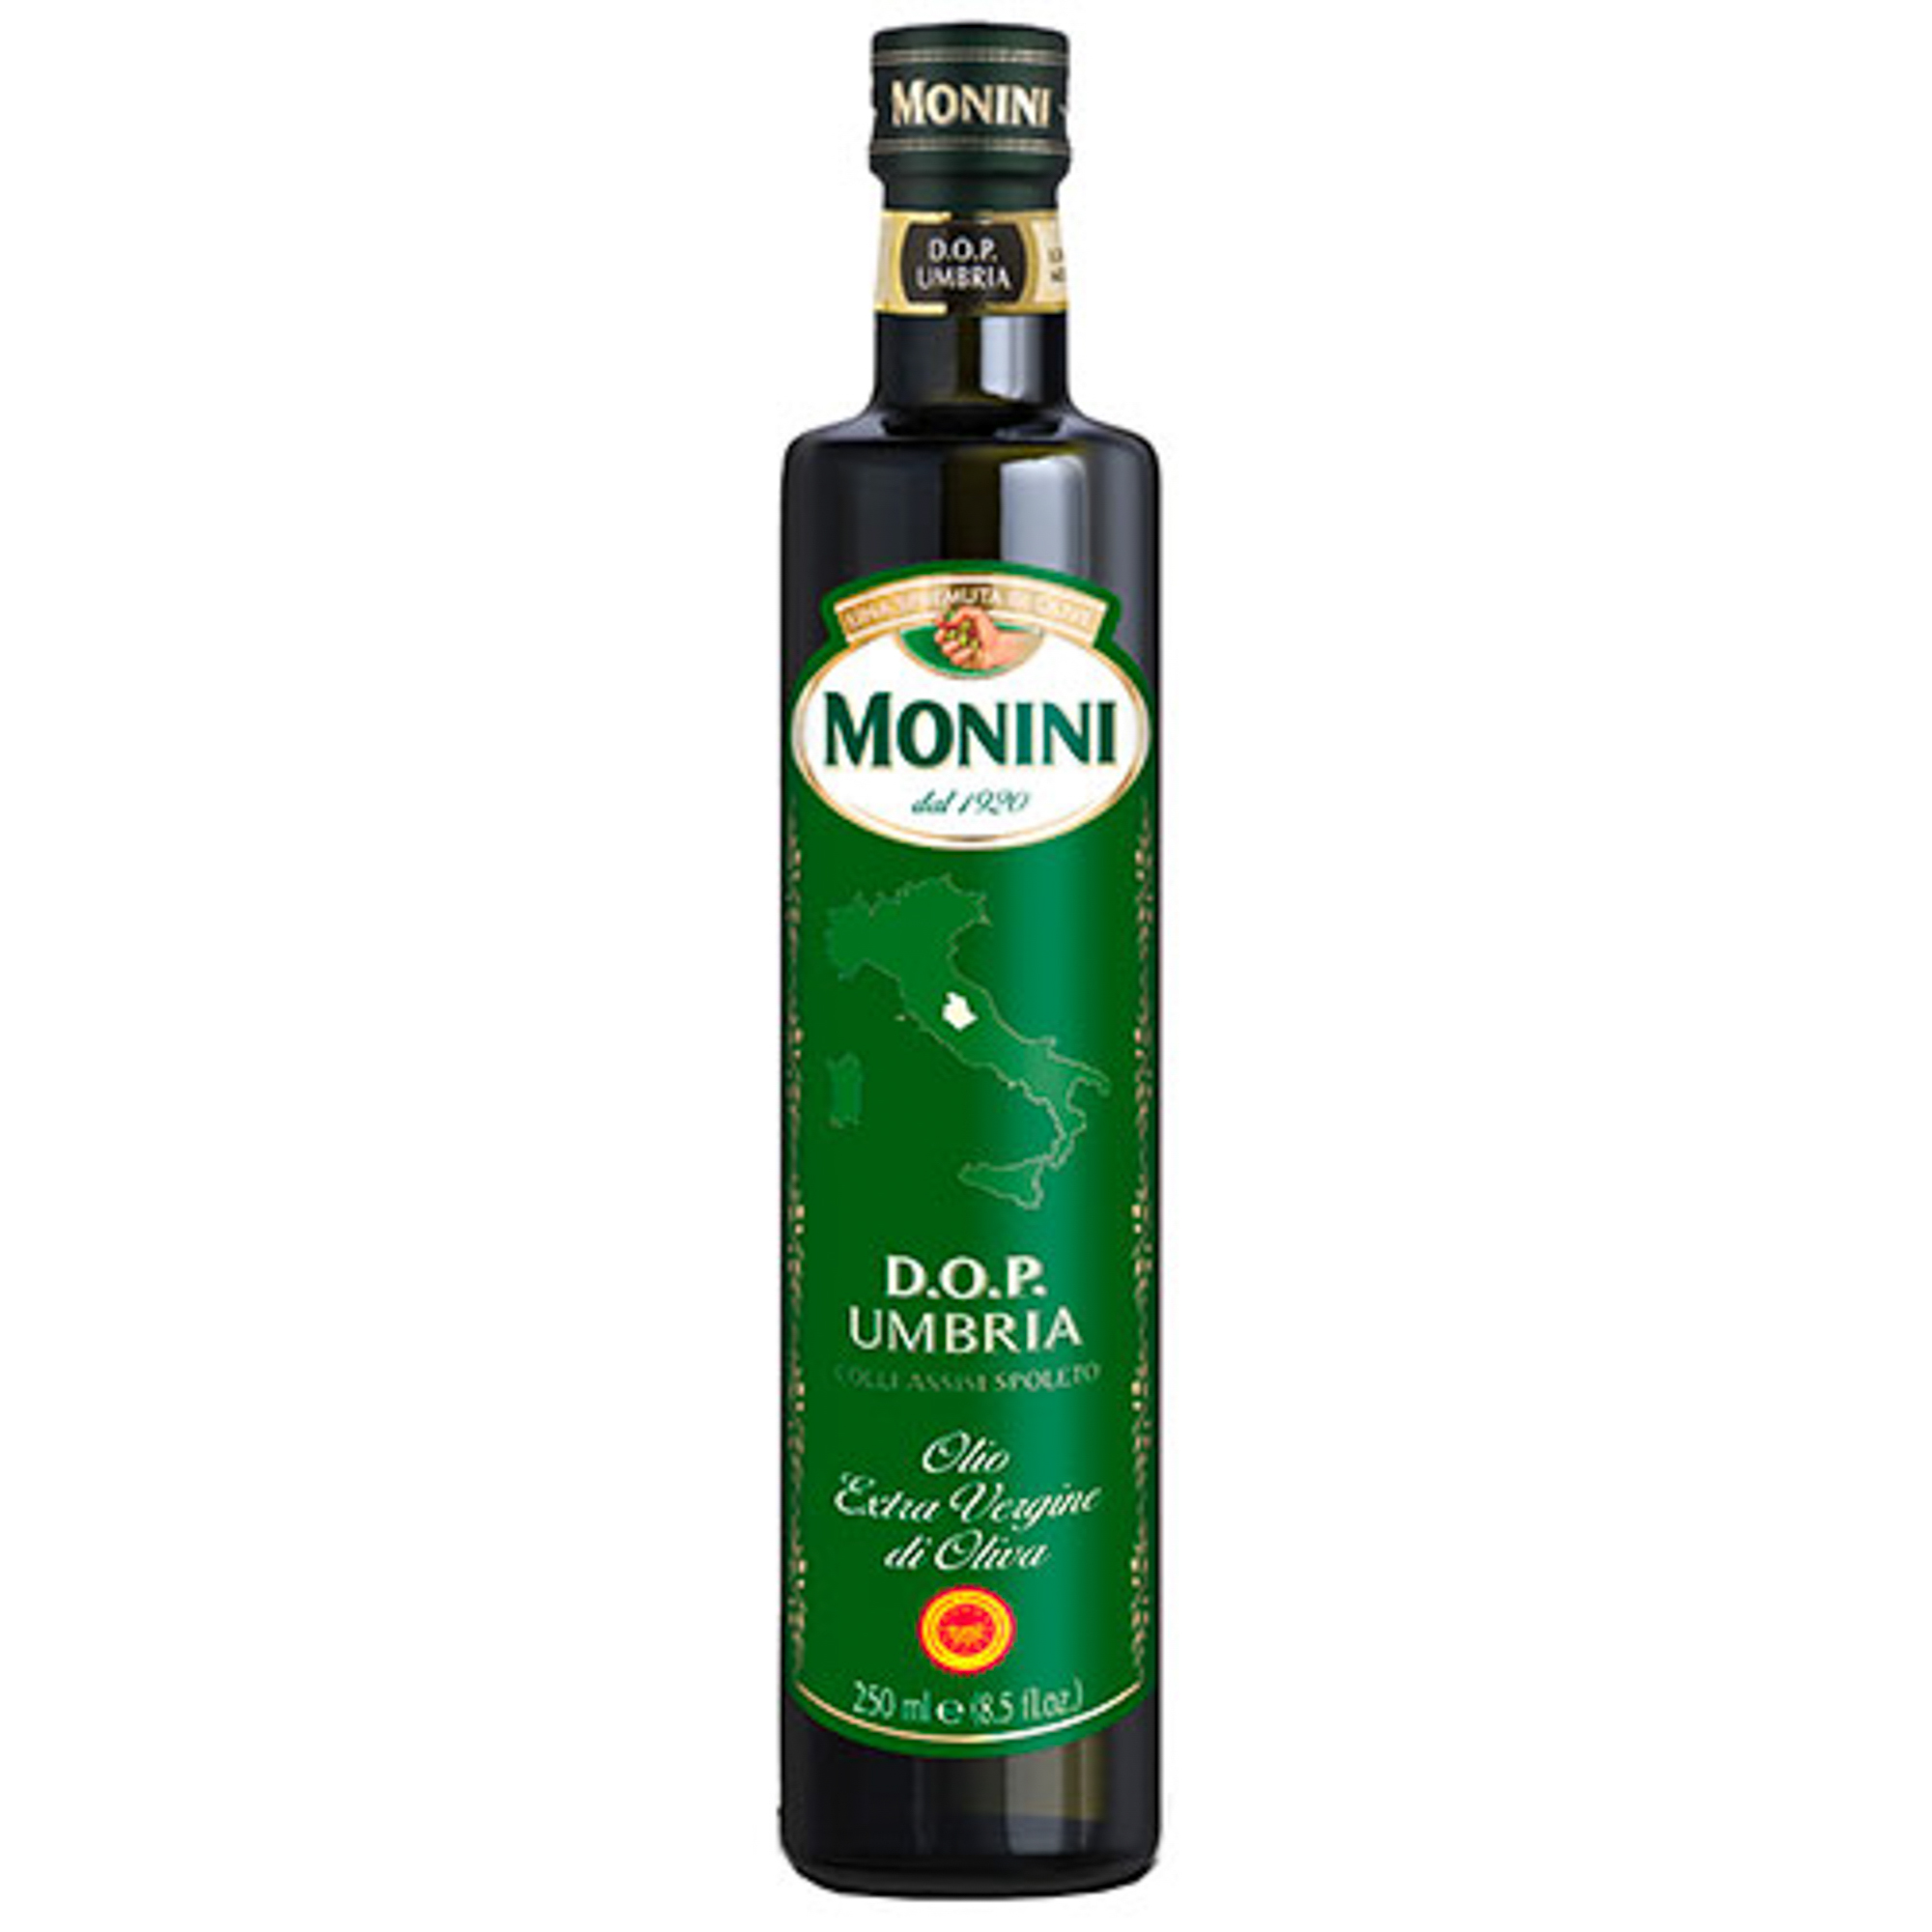 Масло оливковое Monini D.O.P. Umbria Extra Virgin 250 мл korvel оливковое масло extra virgin греция данае 250 мл